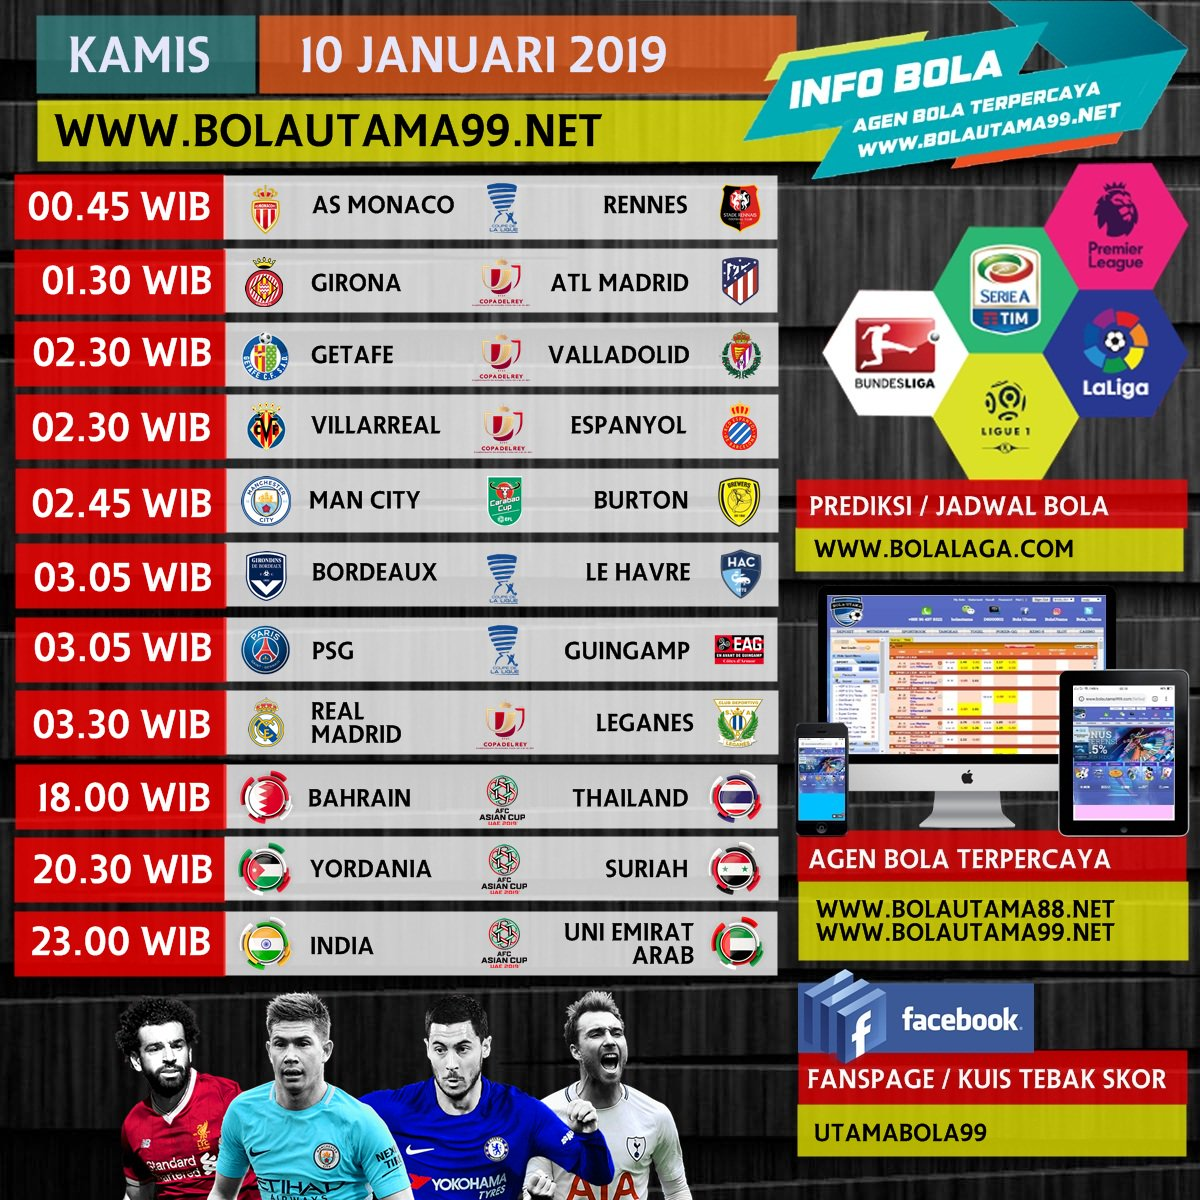 #ligainggris #premierleague #ligaspanyol #kostumfutsal #soccernews #prediksibola #kabarbola #infobola #ligaindonesia #agenbola #score #championsleague #AFC #jadwalbola #cr7 #Messi #prediksibola #ucl #epl